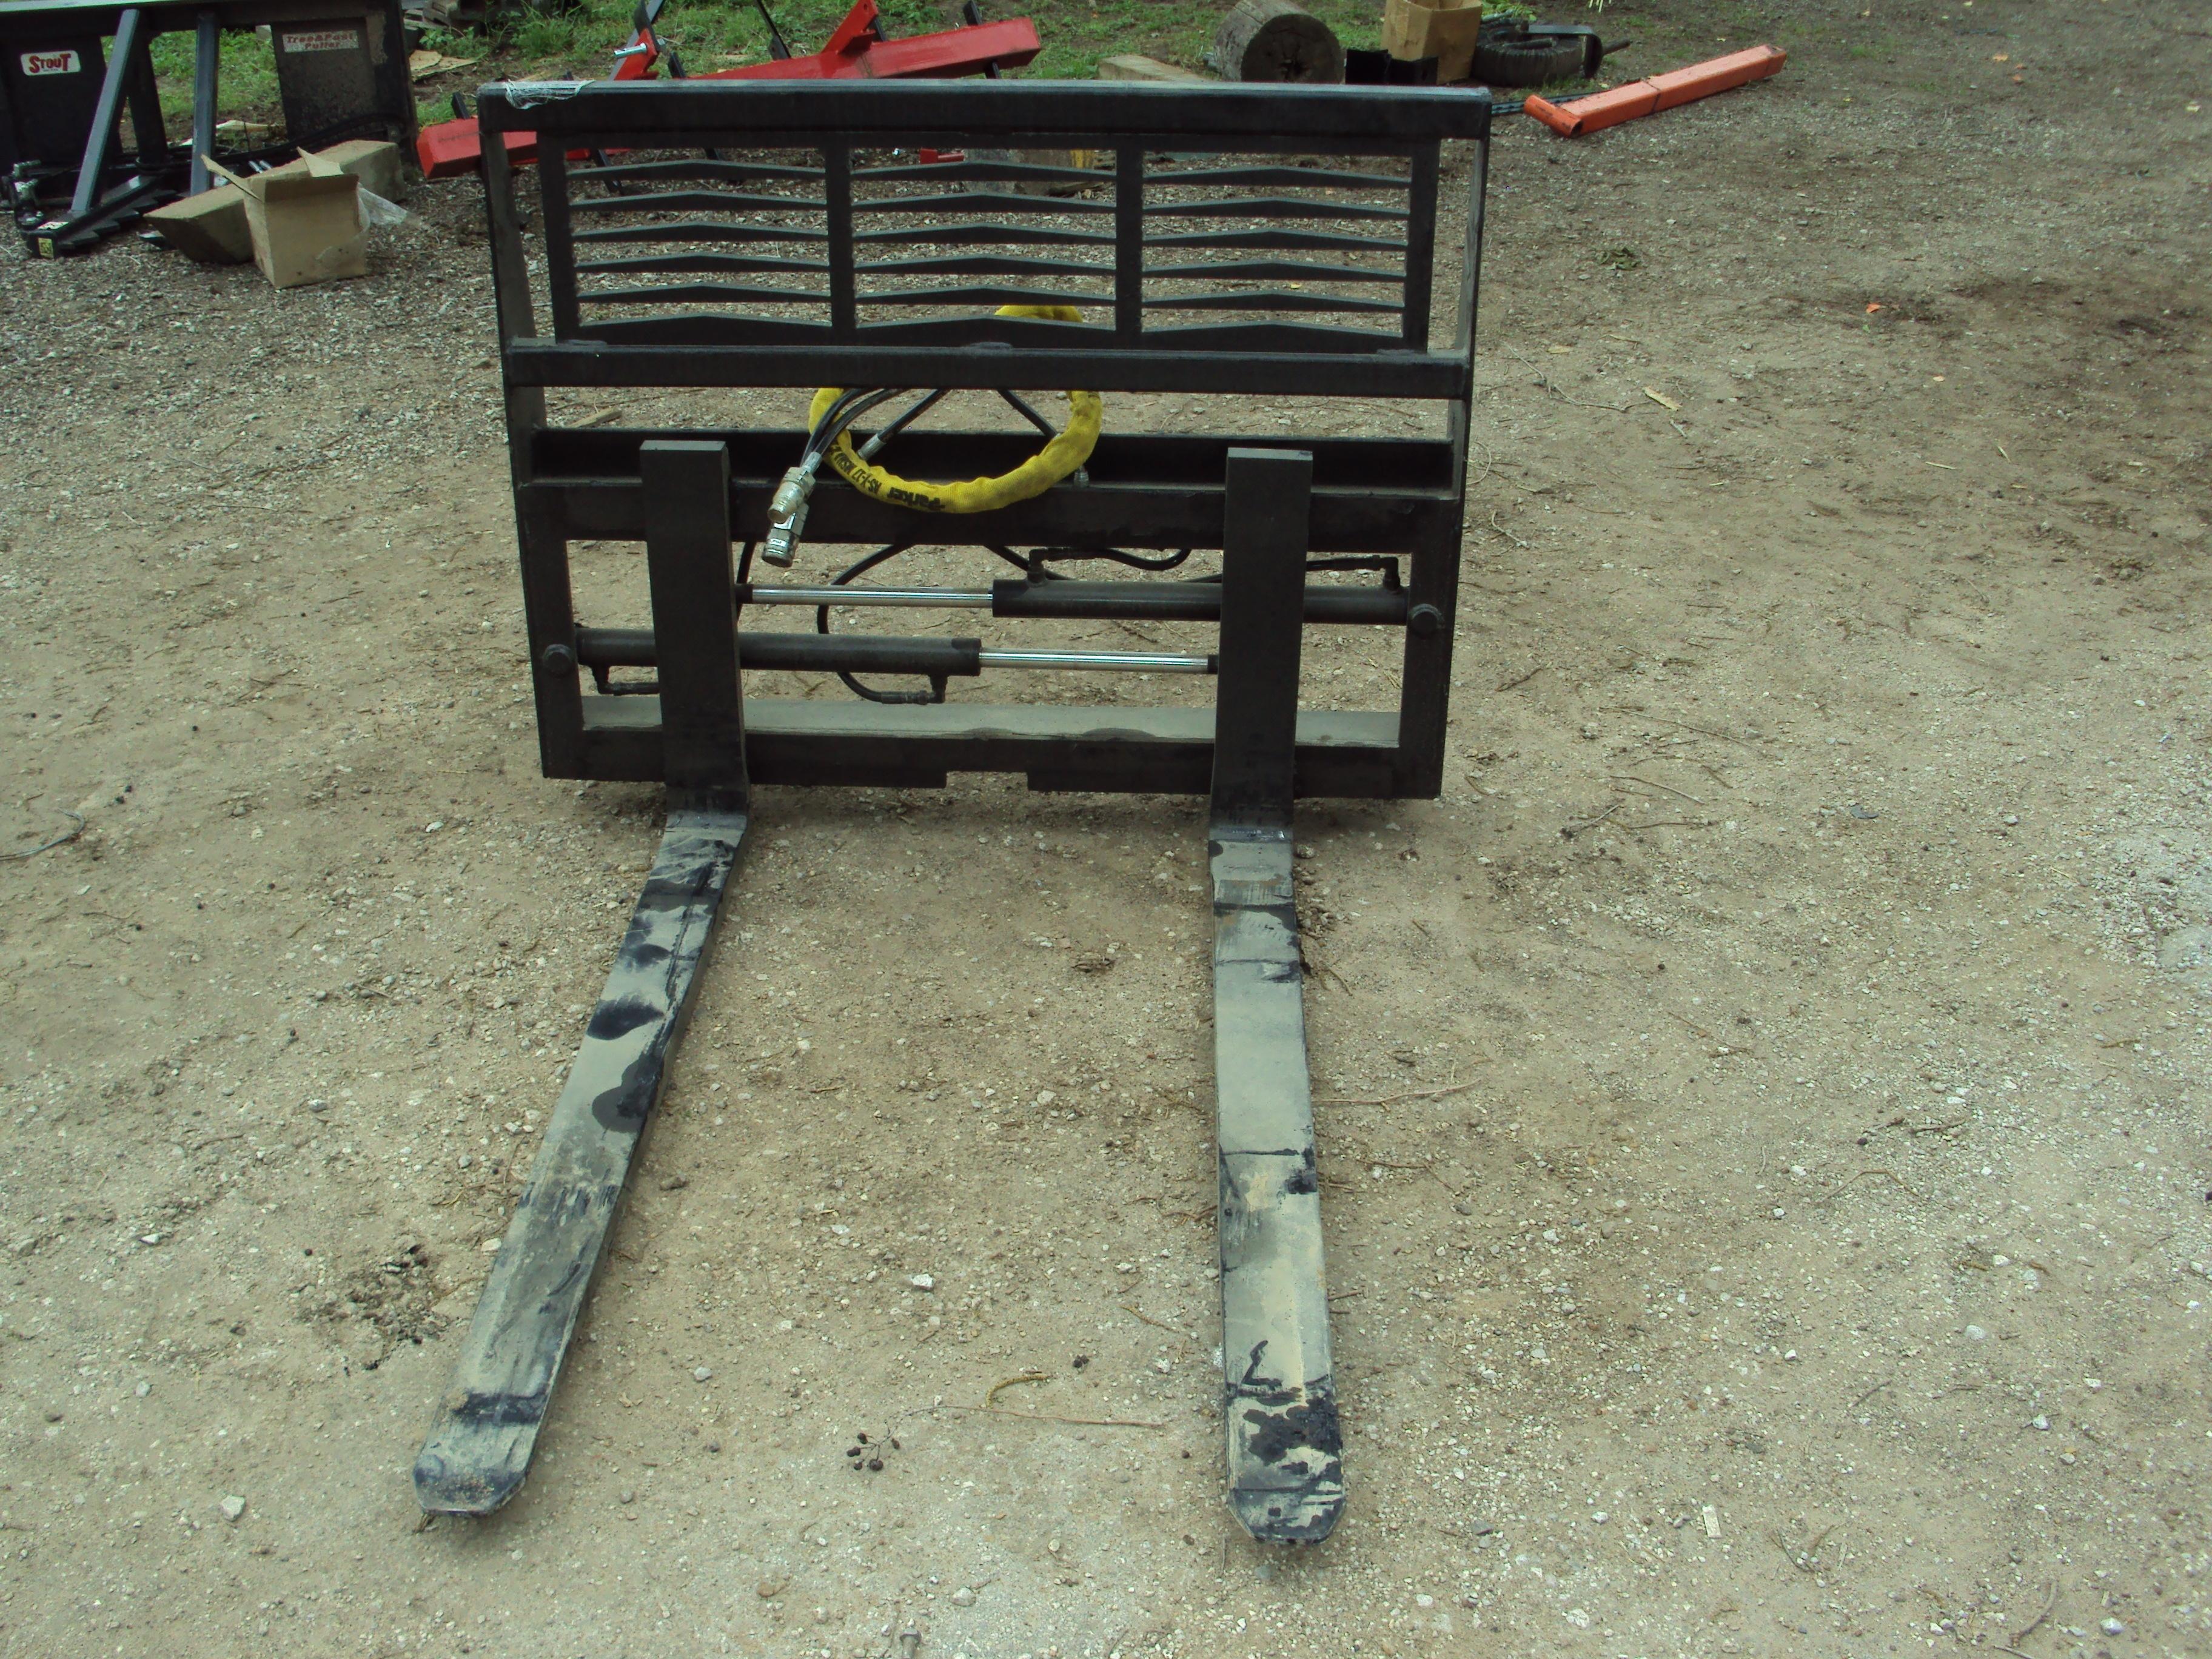 Tractor Adjustable Forks : Equipment other hydraulic adjustable pallet forks for a